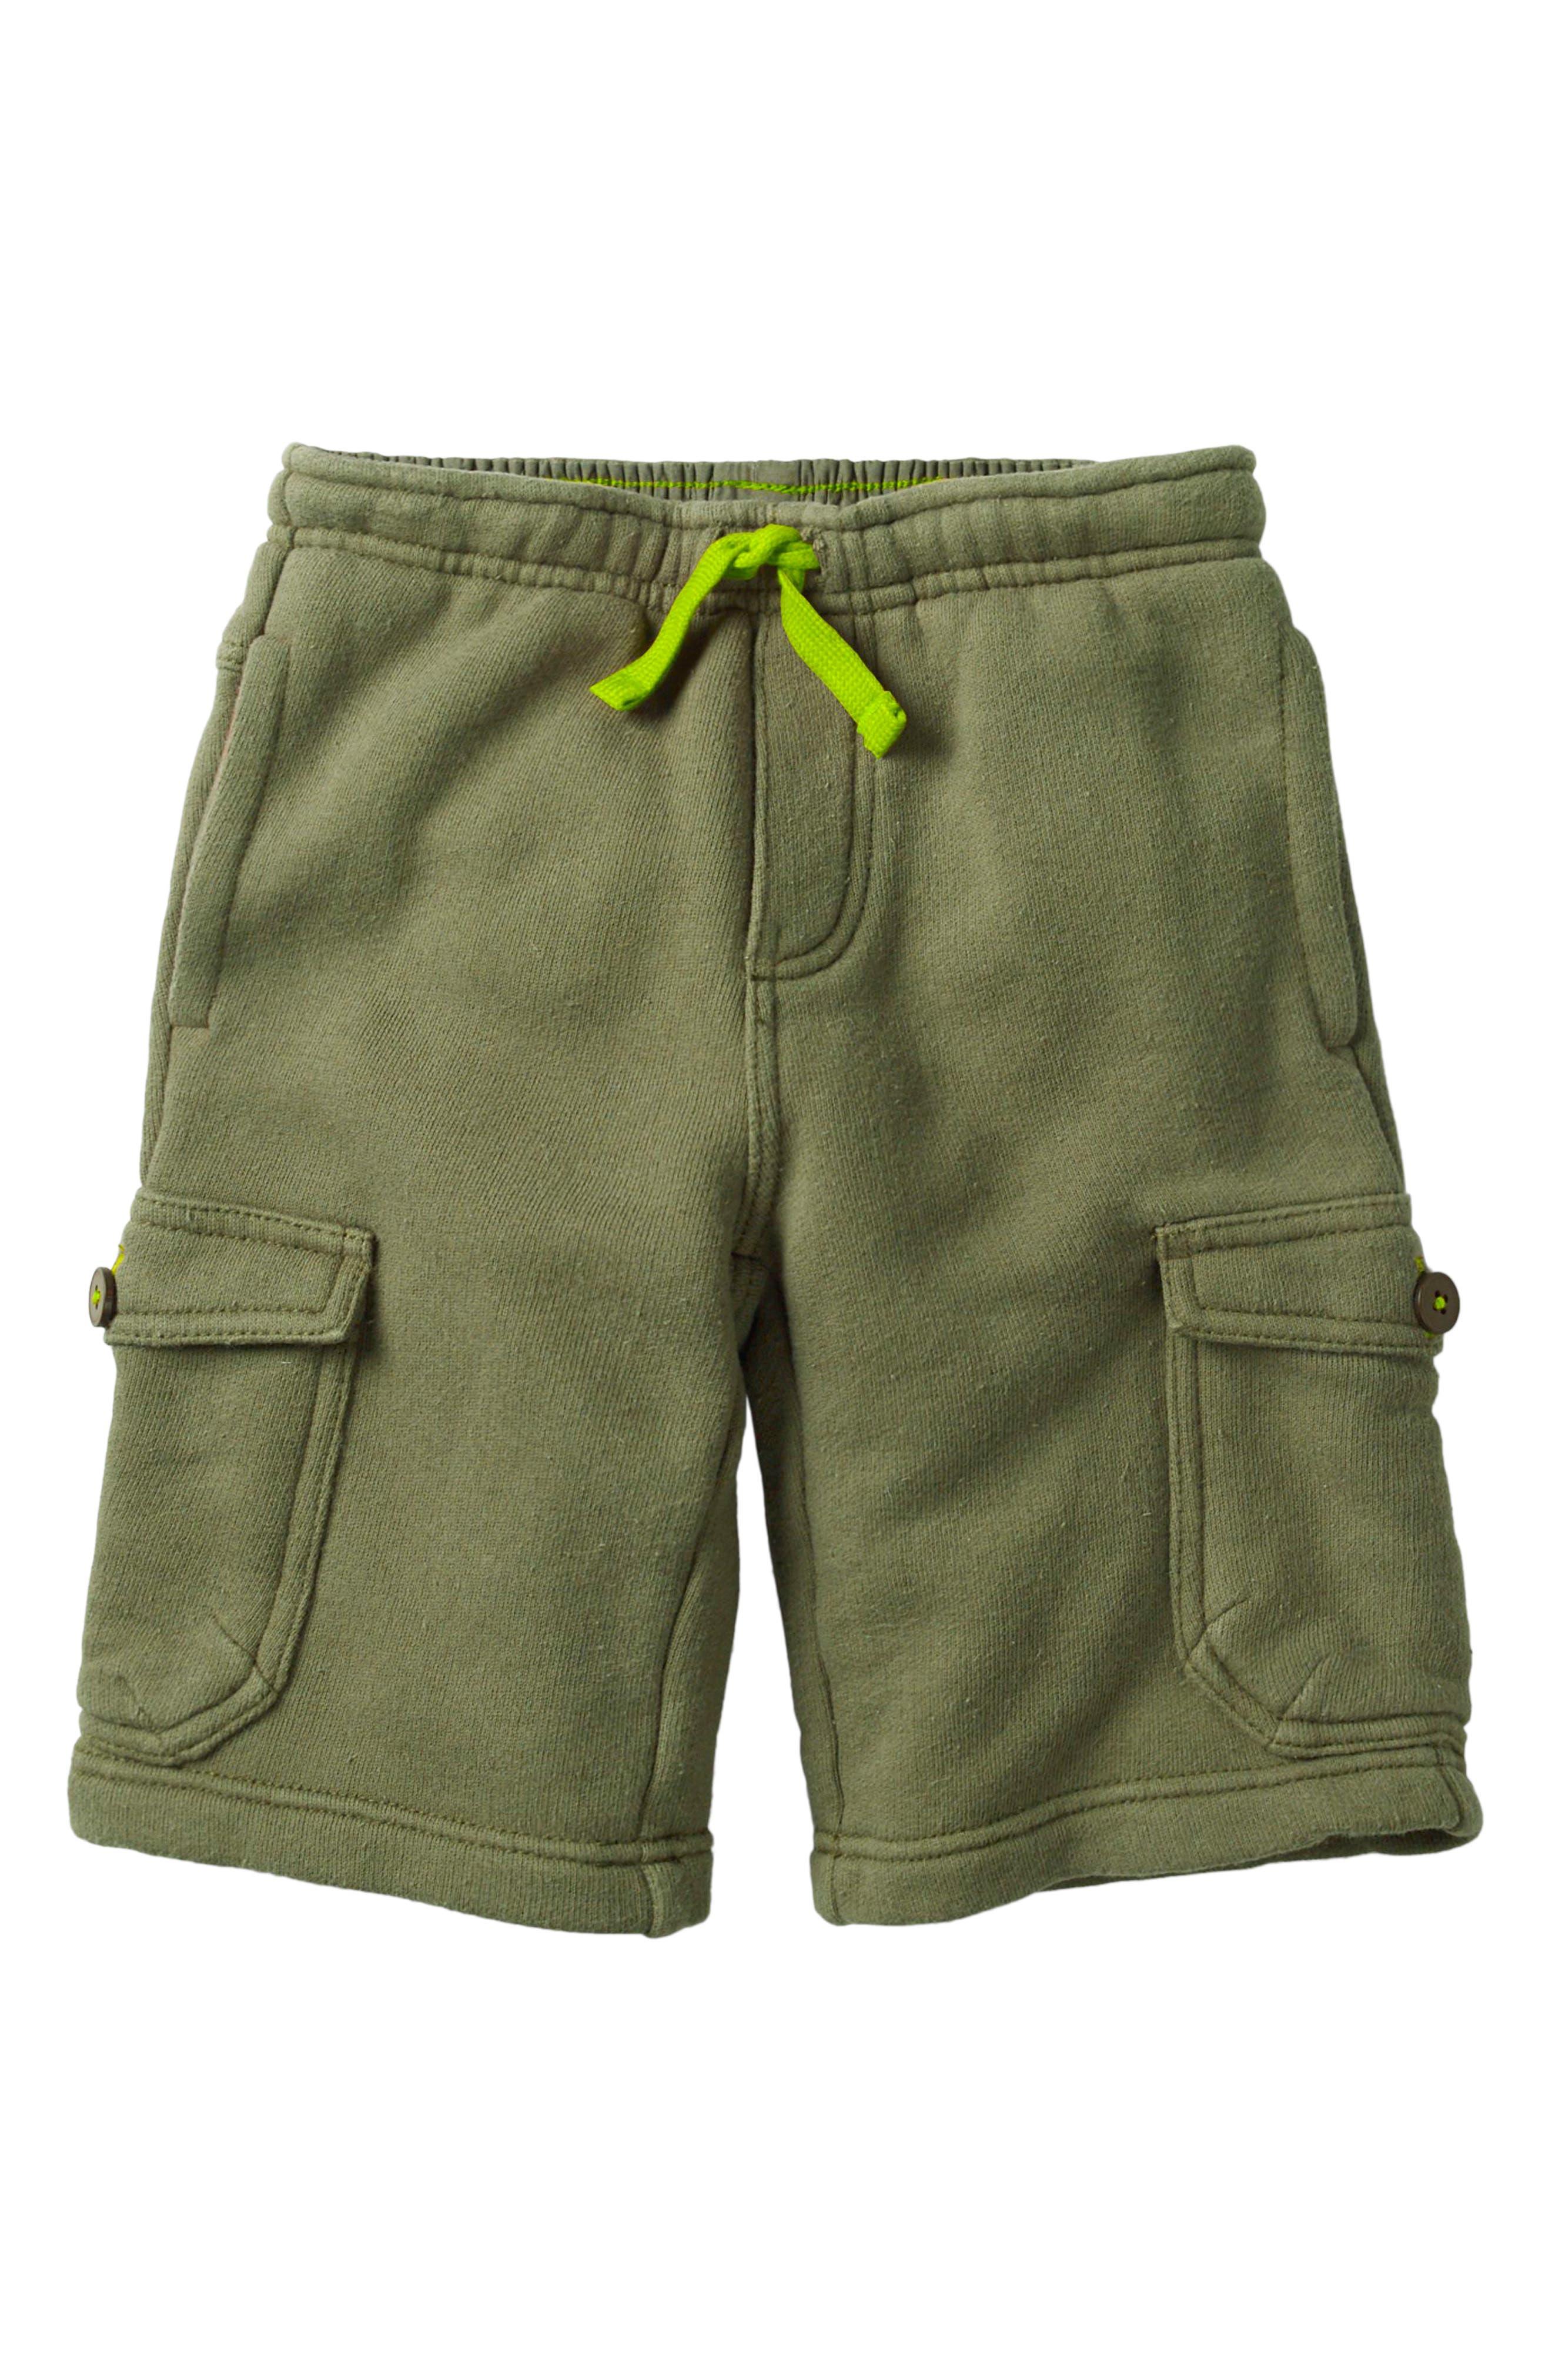 Jersey Cargo Shorts,                             Main thumbnail 1, color,                             304